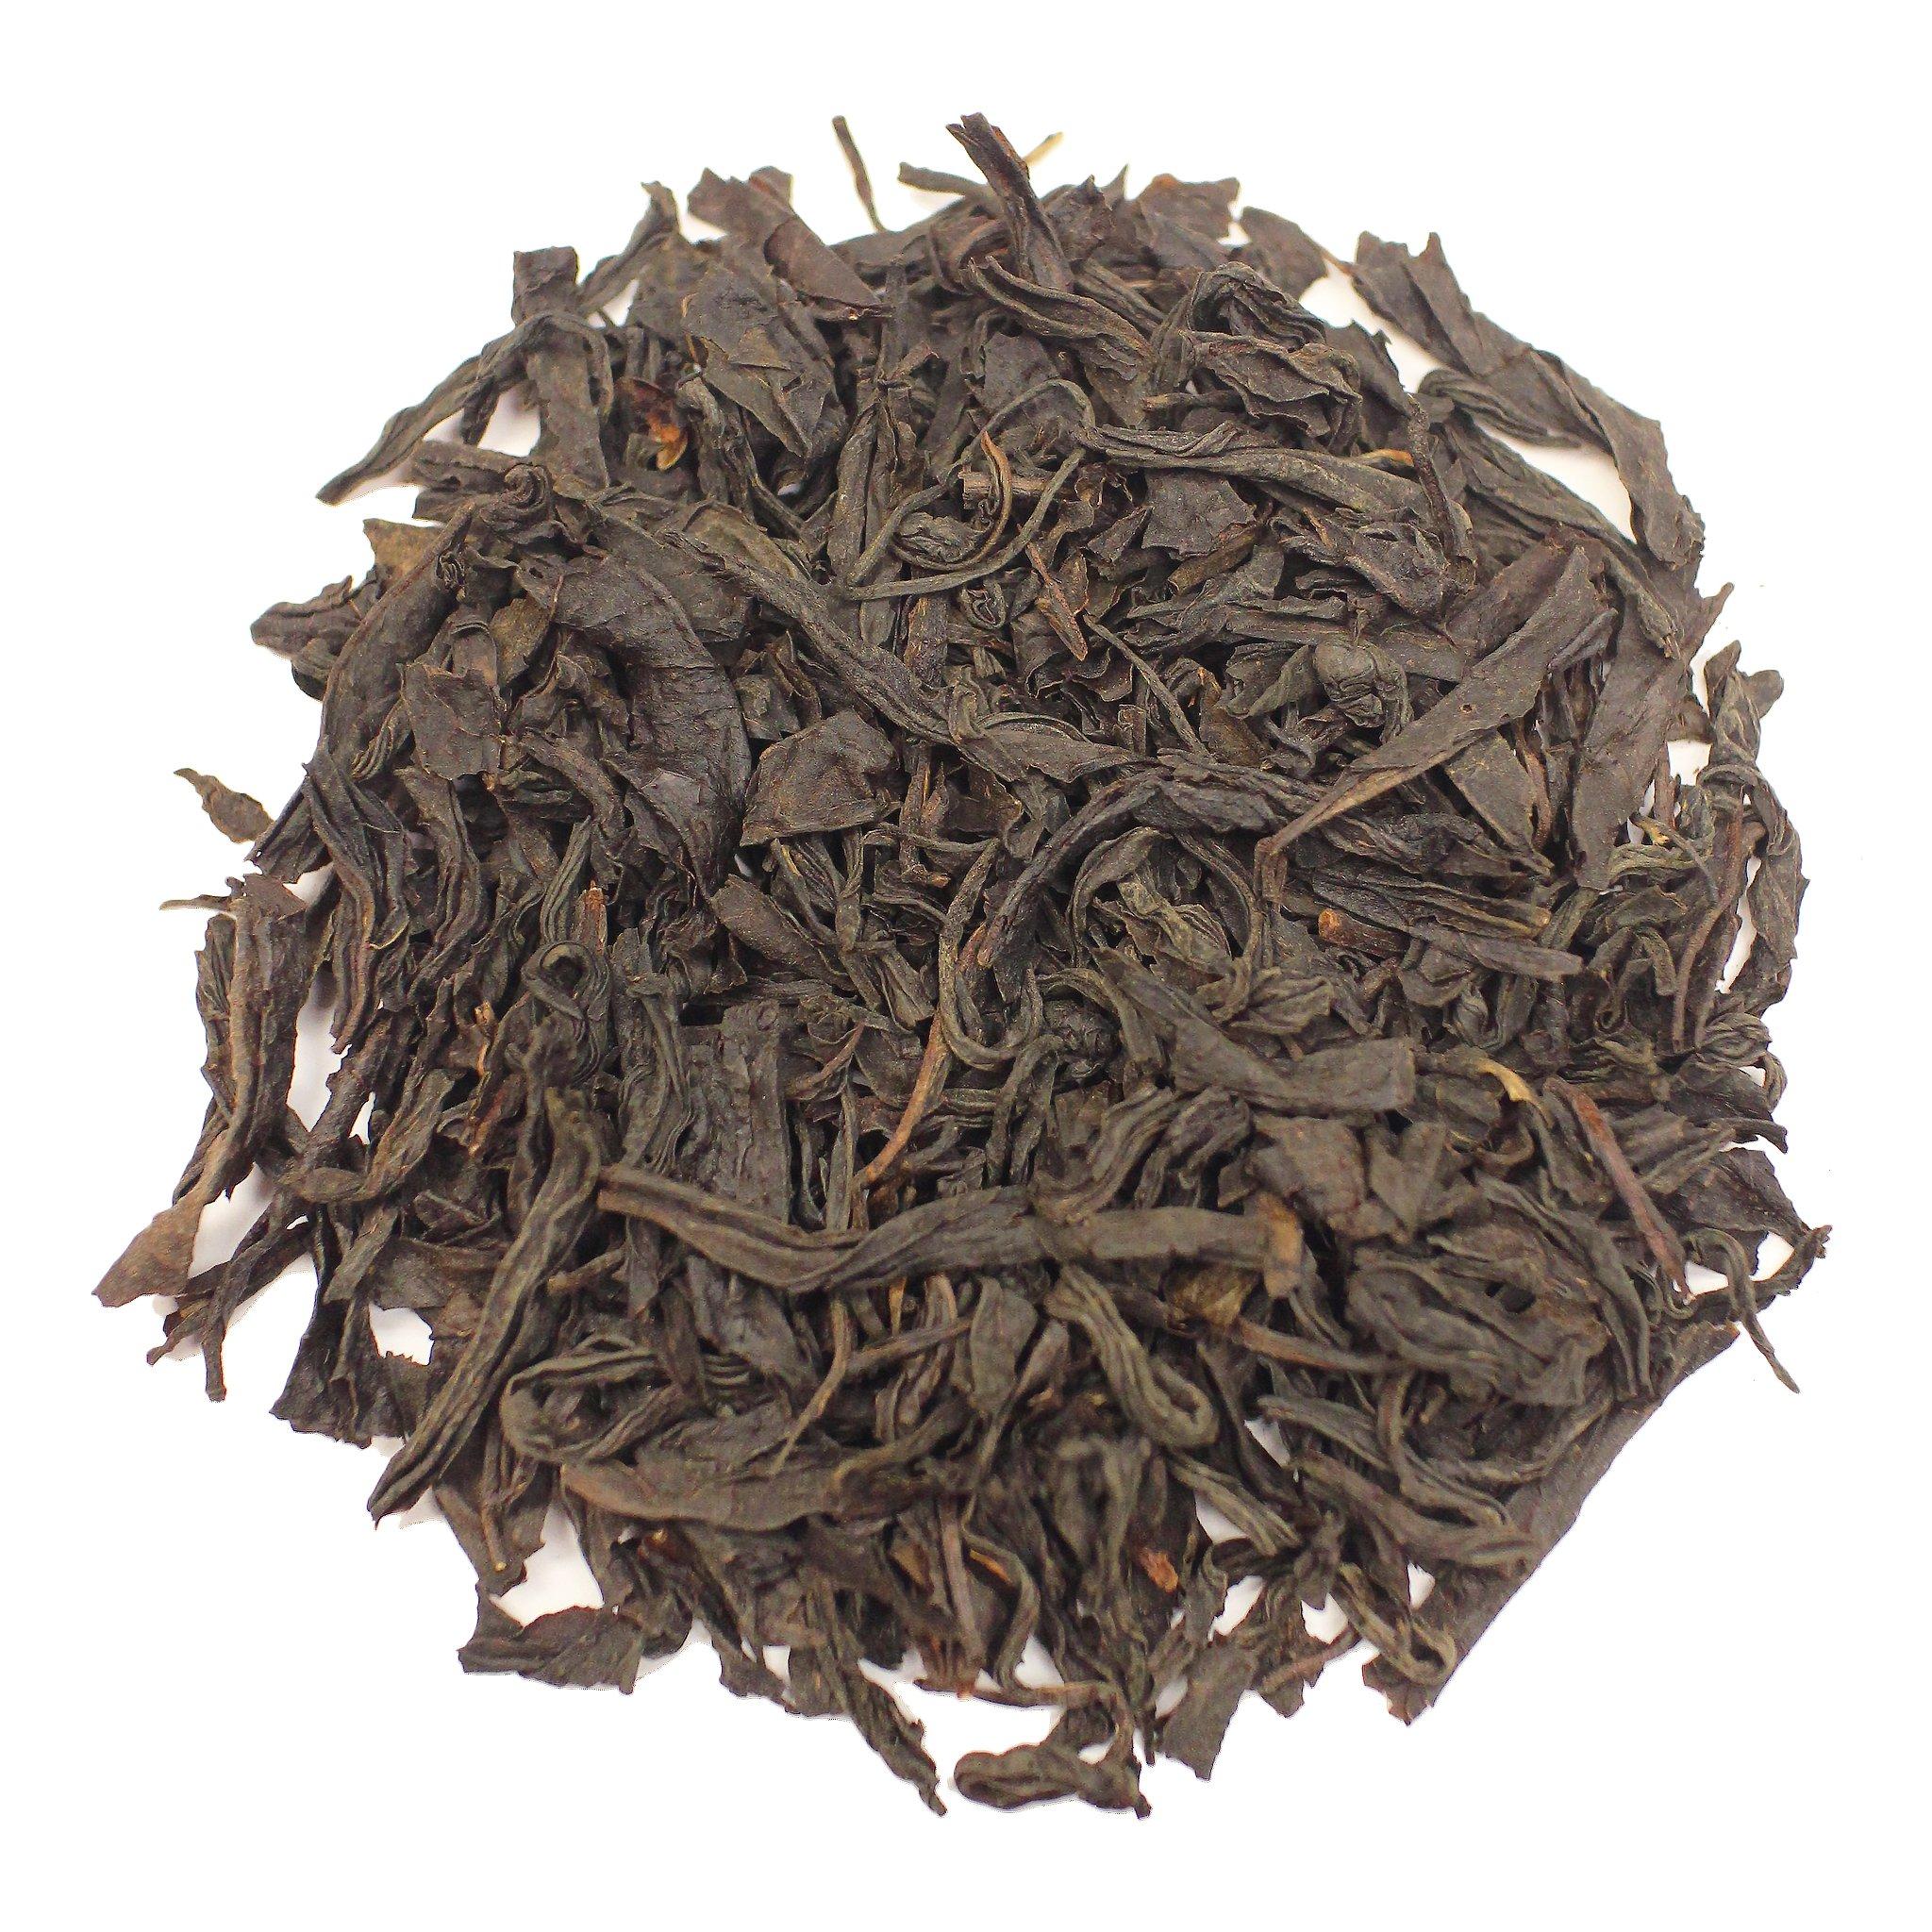 The Tea Farm - Big Red Robe Oolong Tea - Chinese Loose Leaf Oolong Tea (8 Ounce Bag) by The Tea Farm